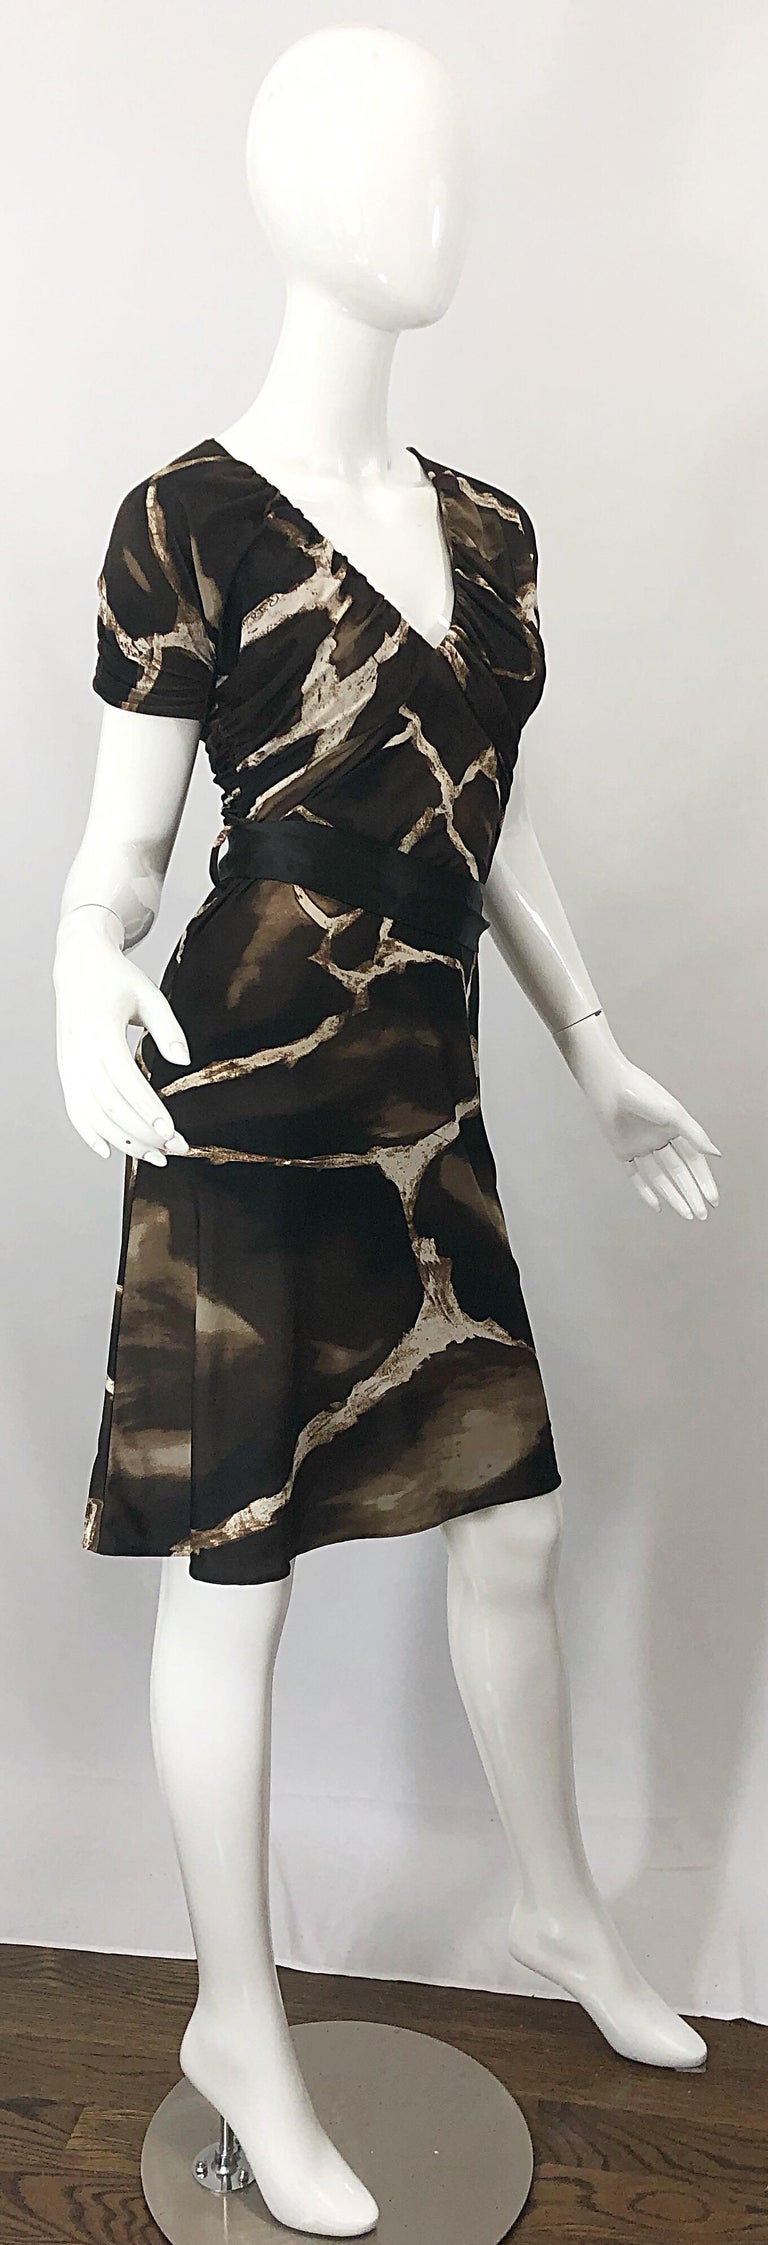 1980s Roberto Cavalli for Neiman Marcus Giraffe Print Vintage 80s Jersey Dress For Sale 6